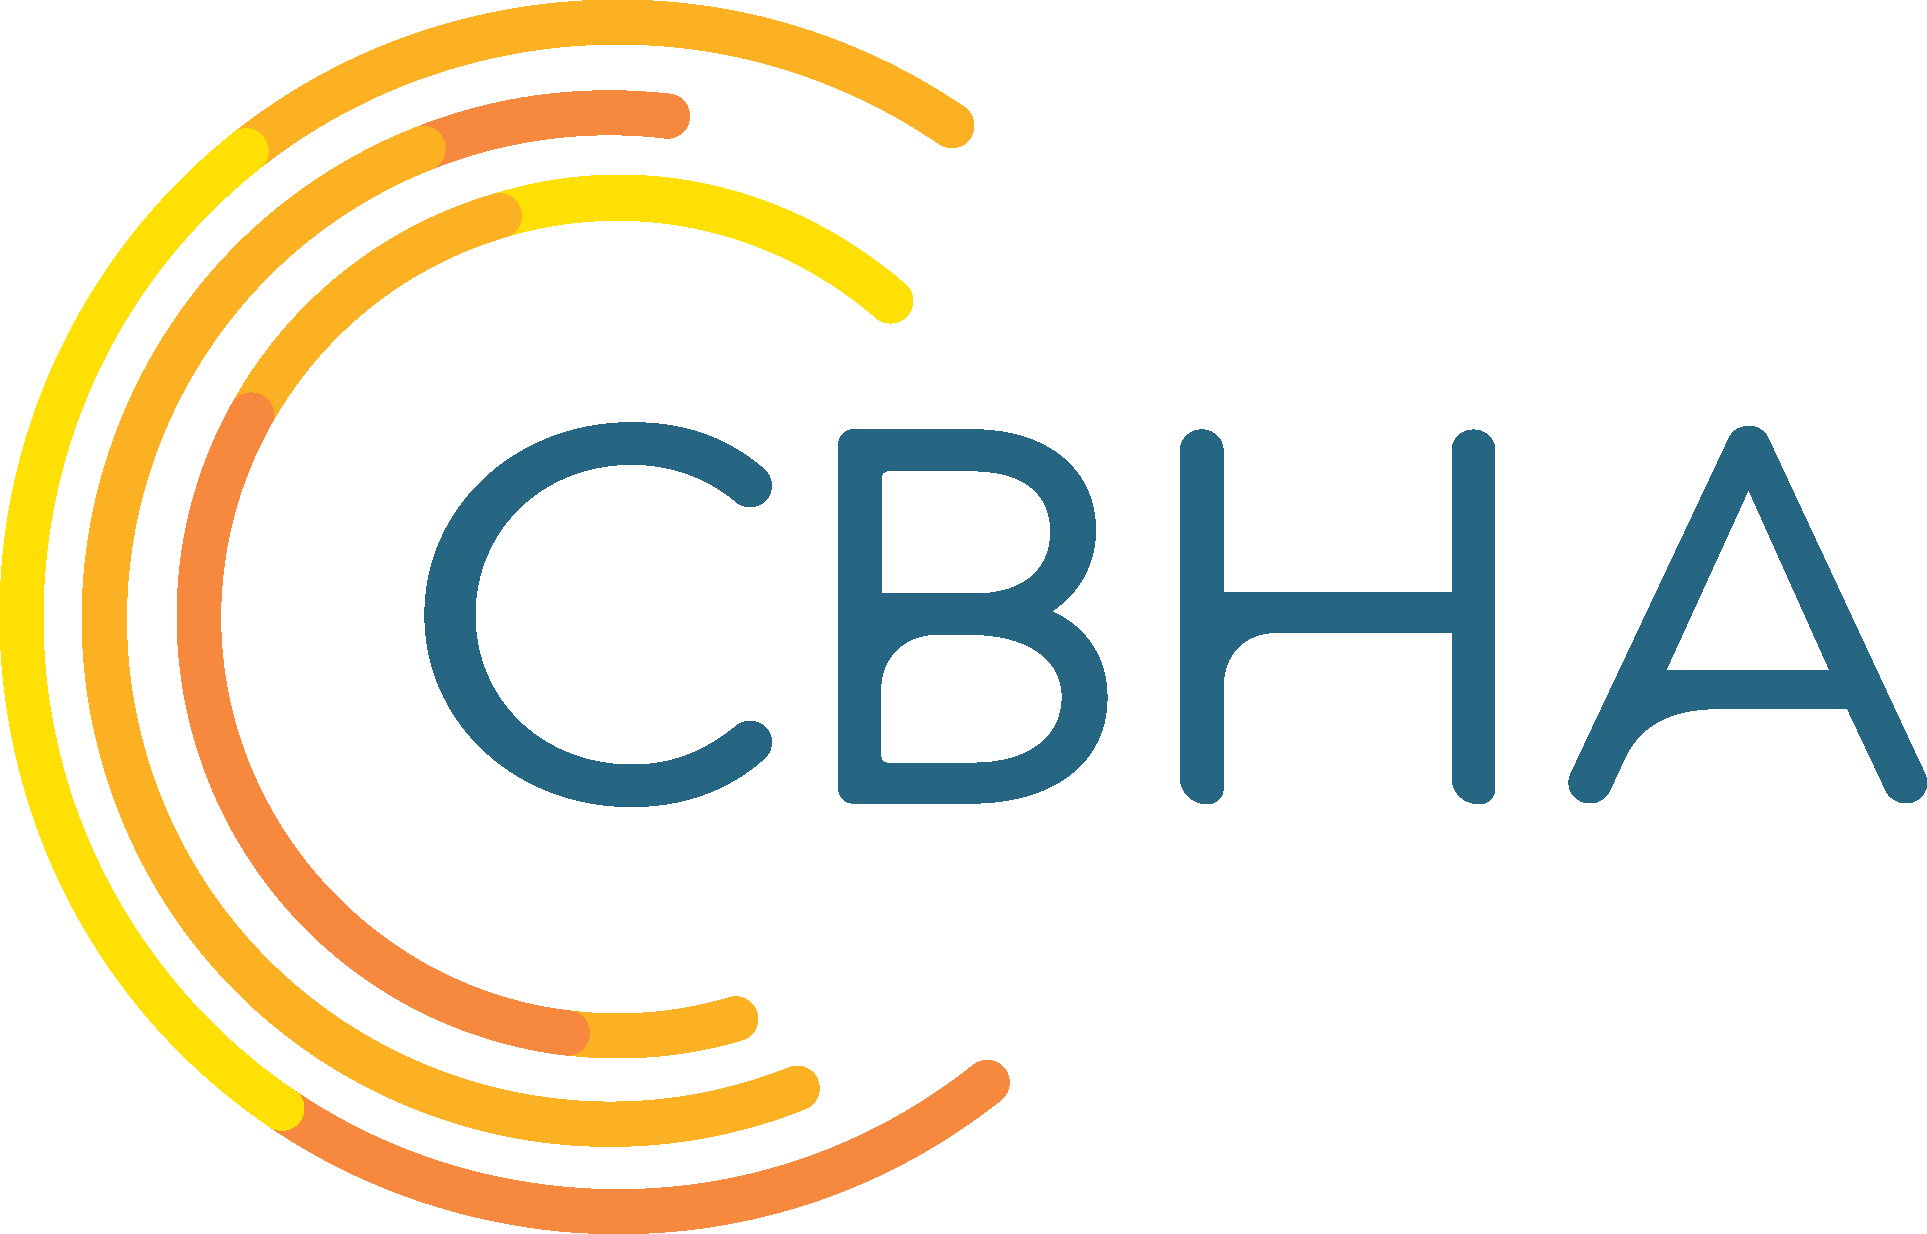 CBHA Logo Final PNG.png